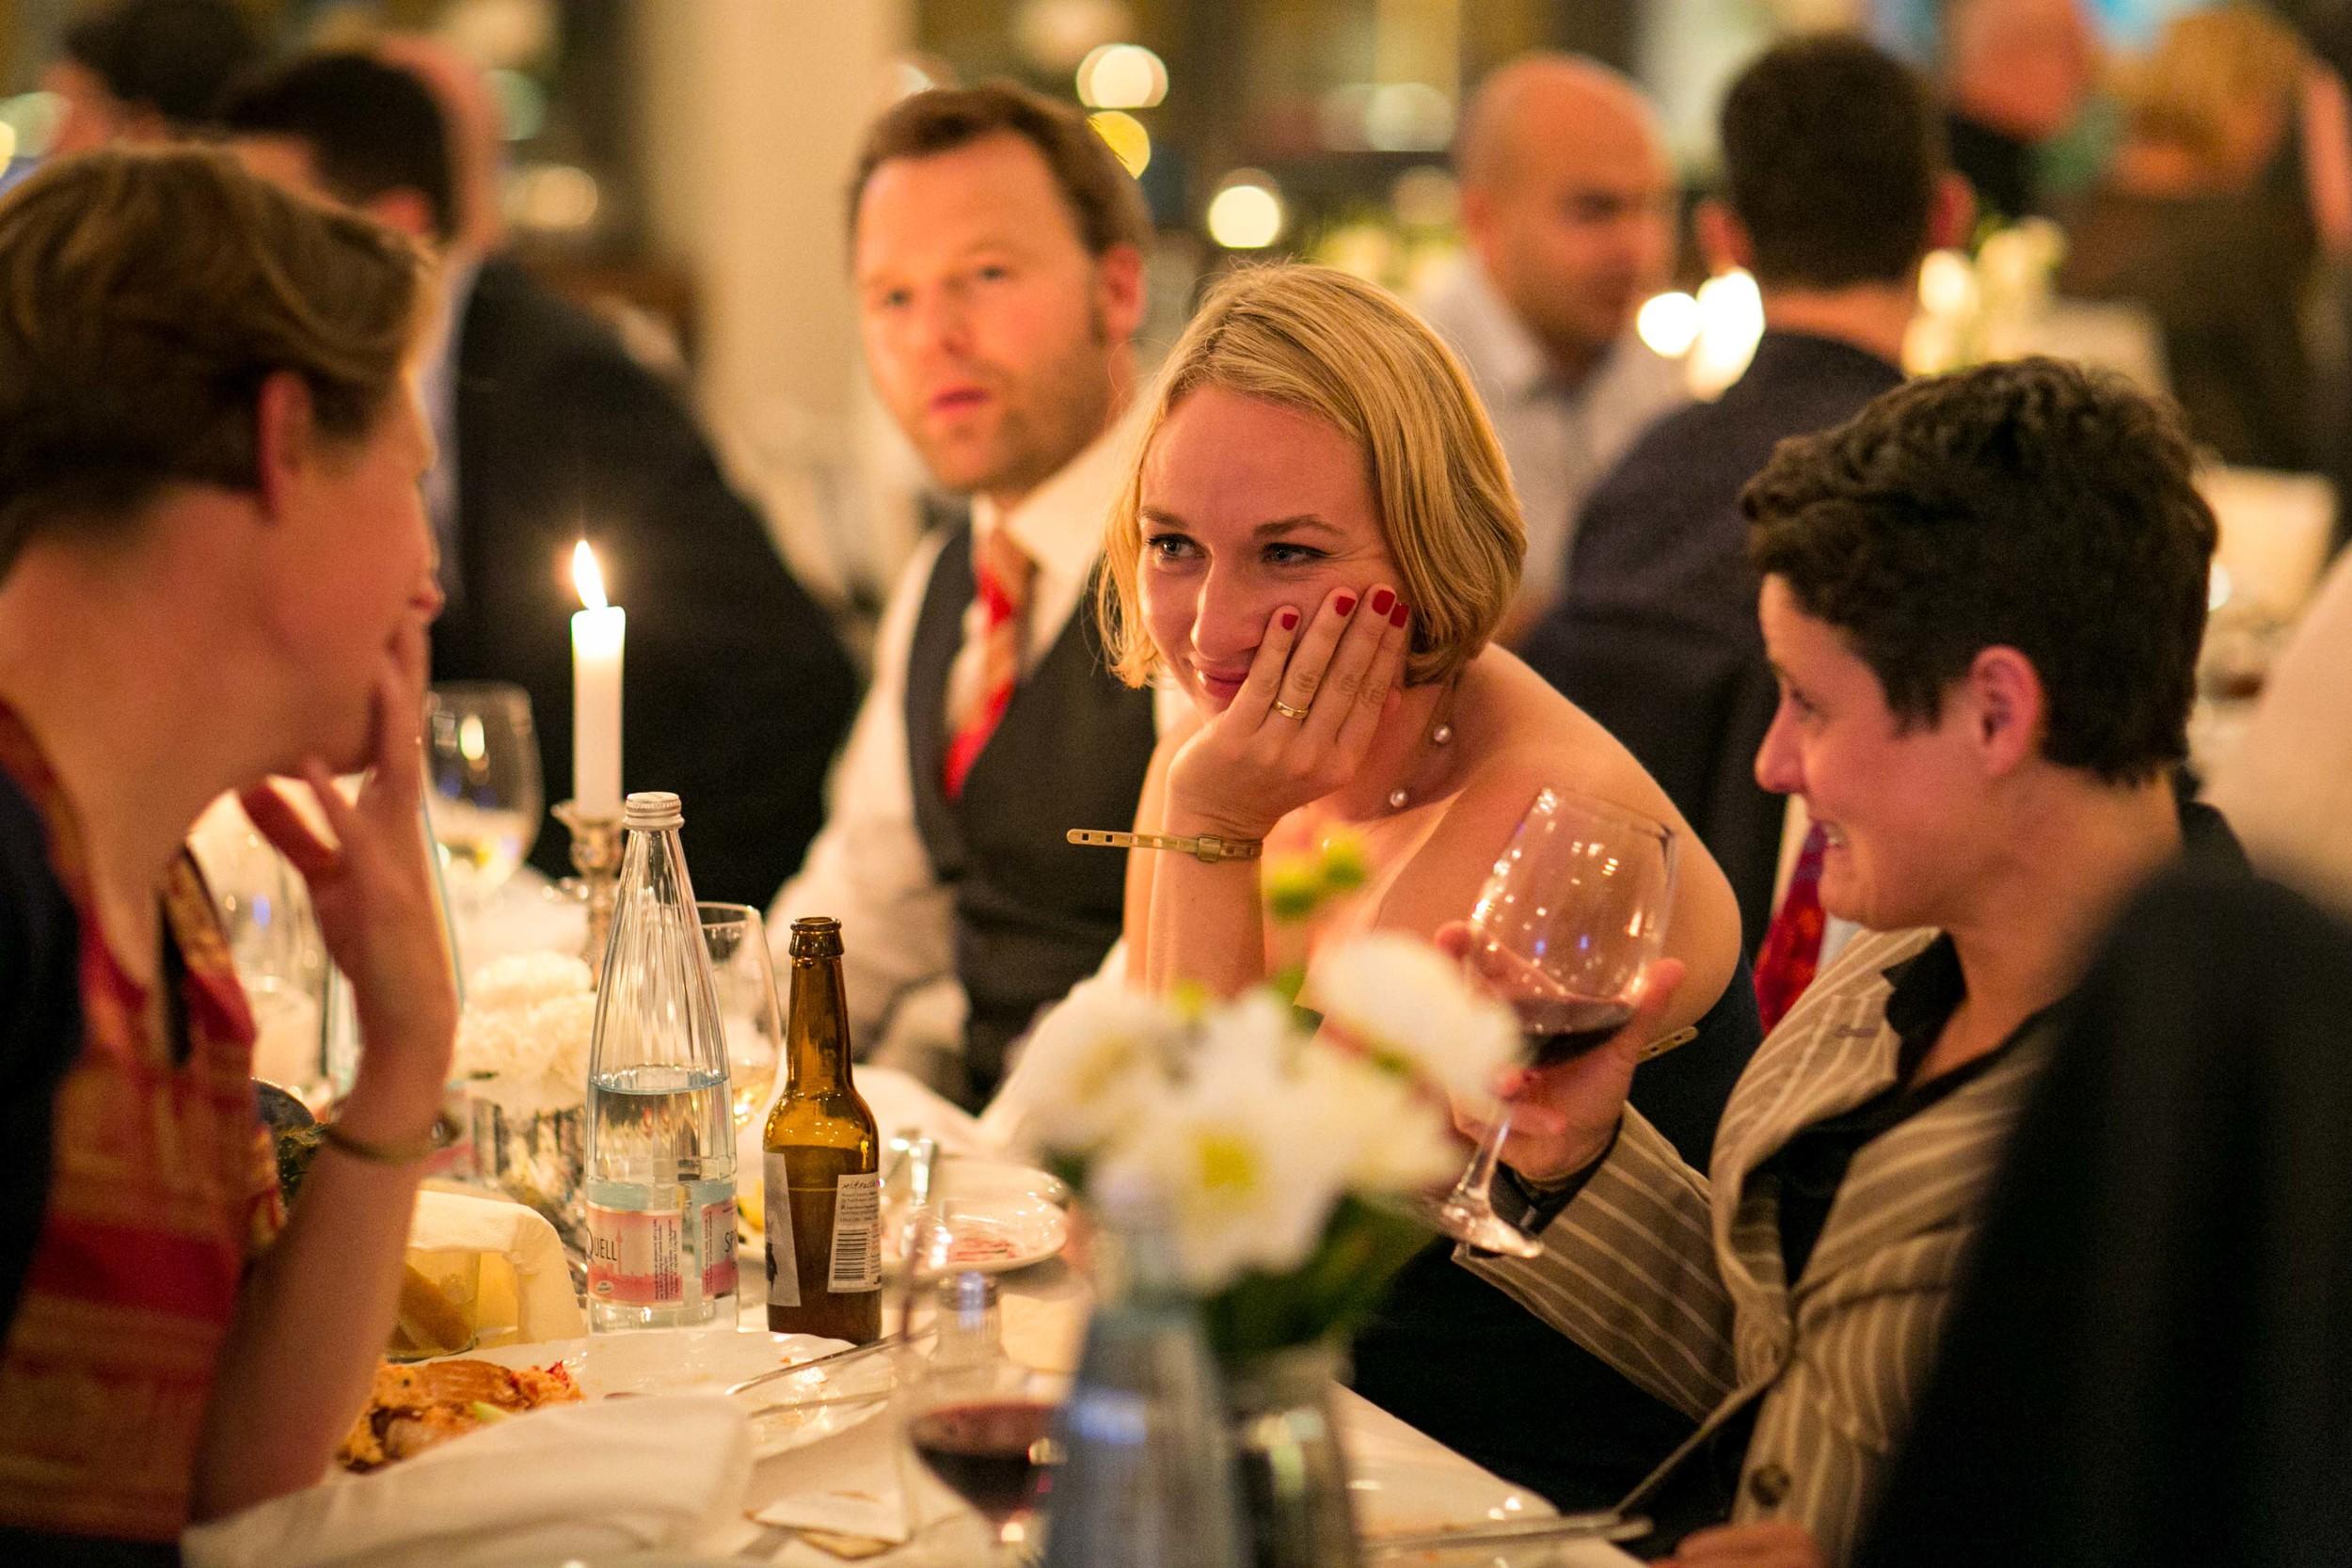 Michelberger Hotel Berlin Hochzeitsfotografie_Fran Burrows Fotografie-106.jpg